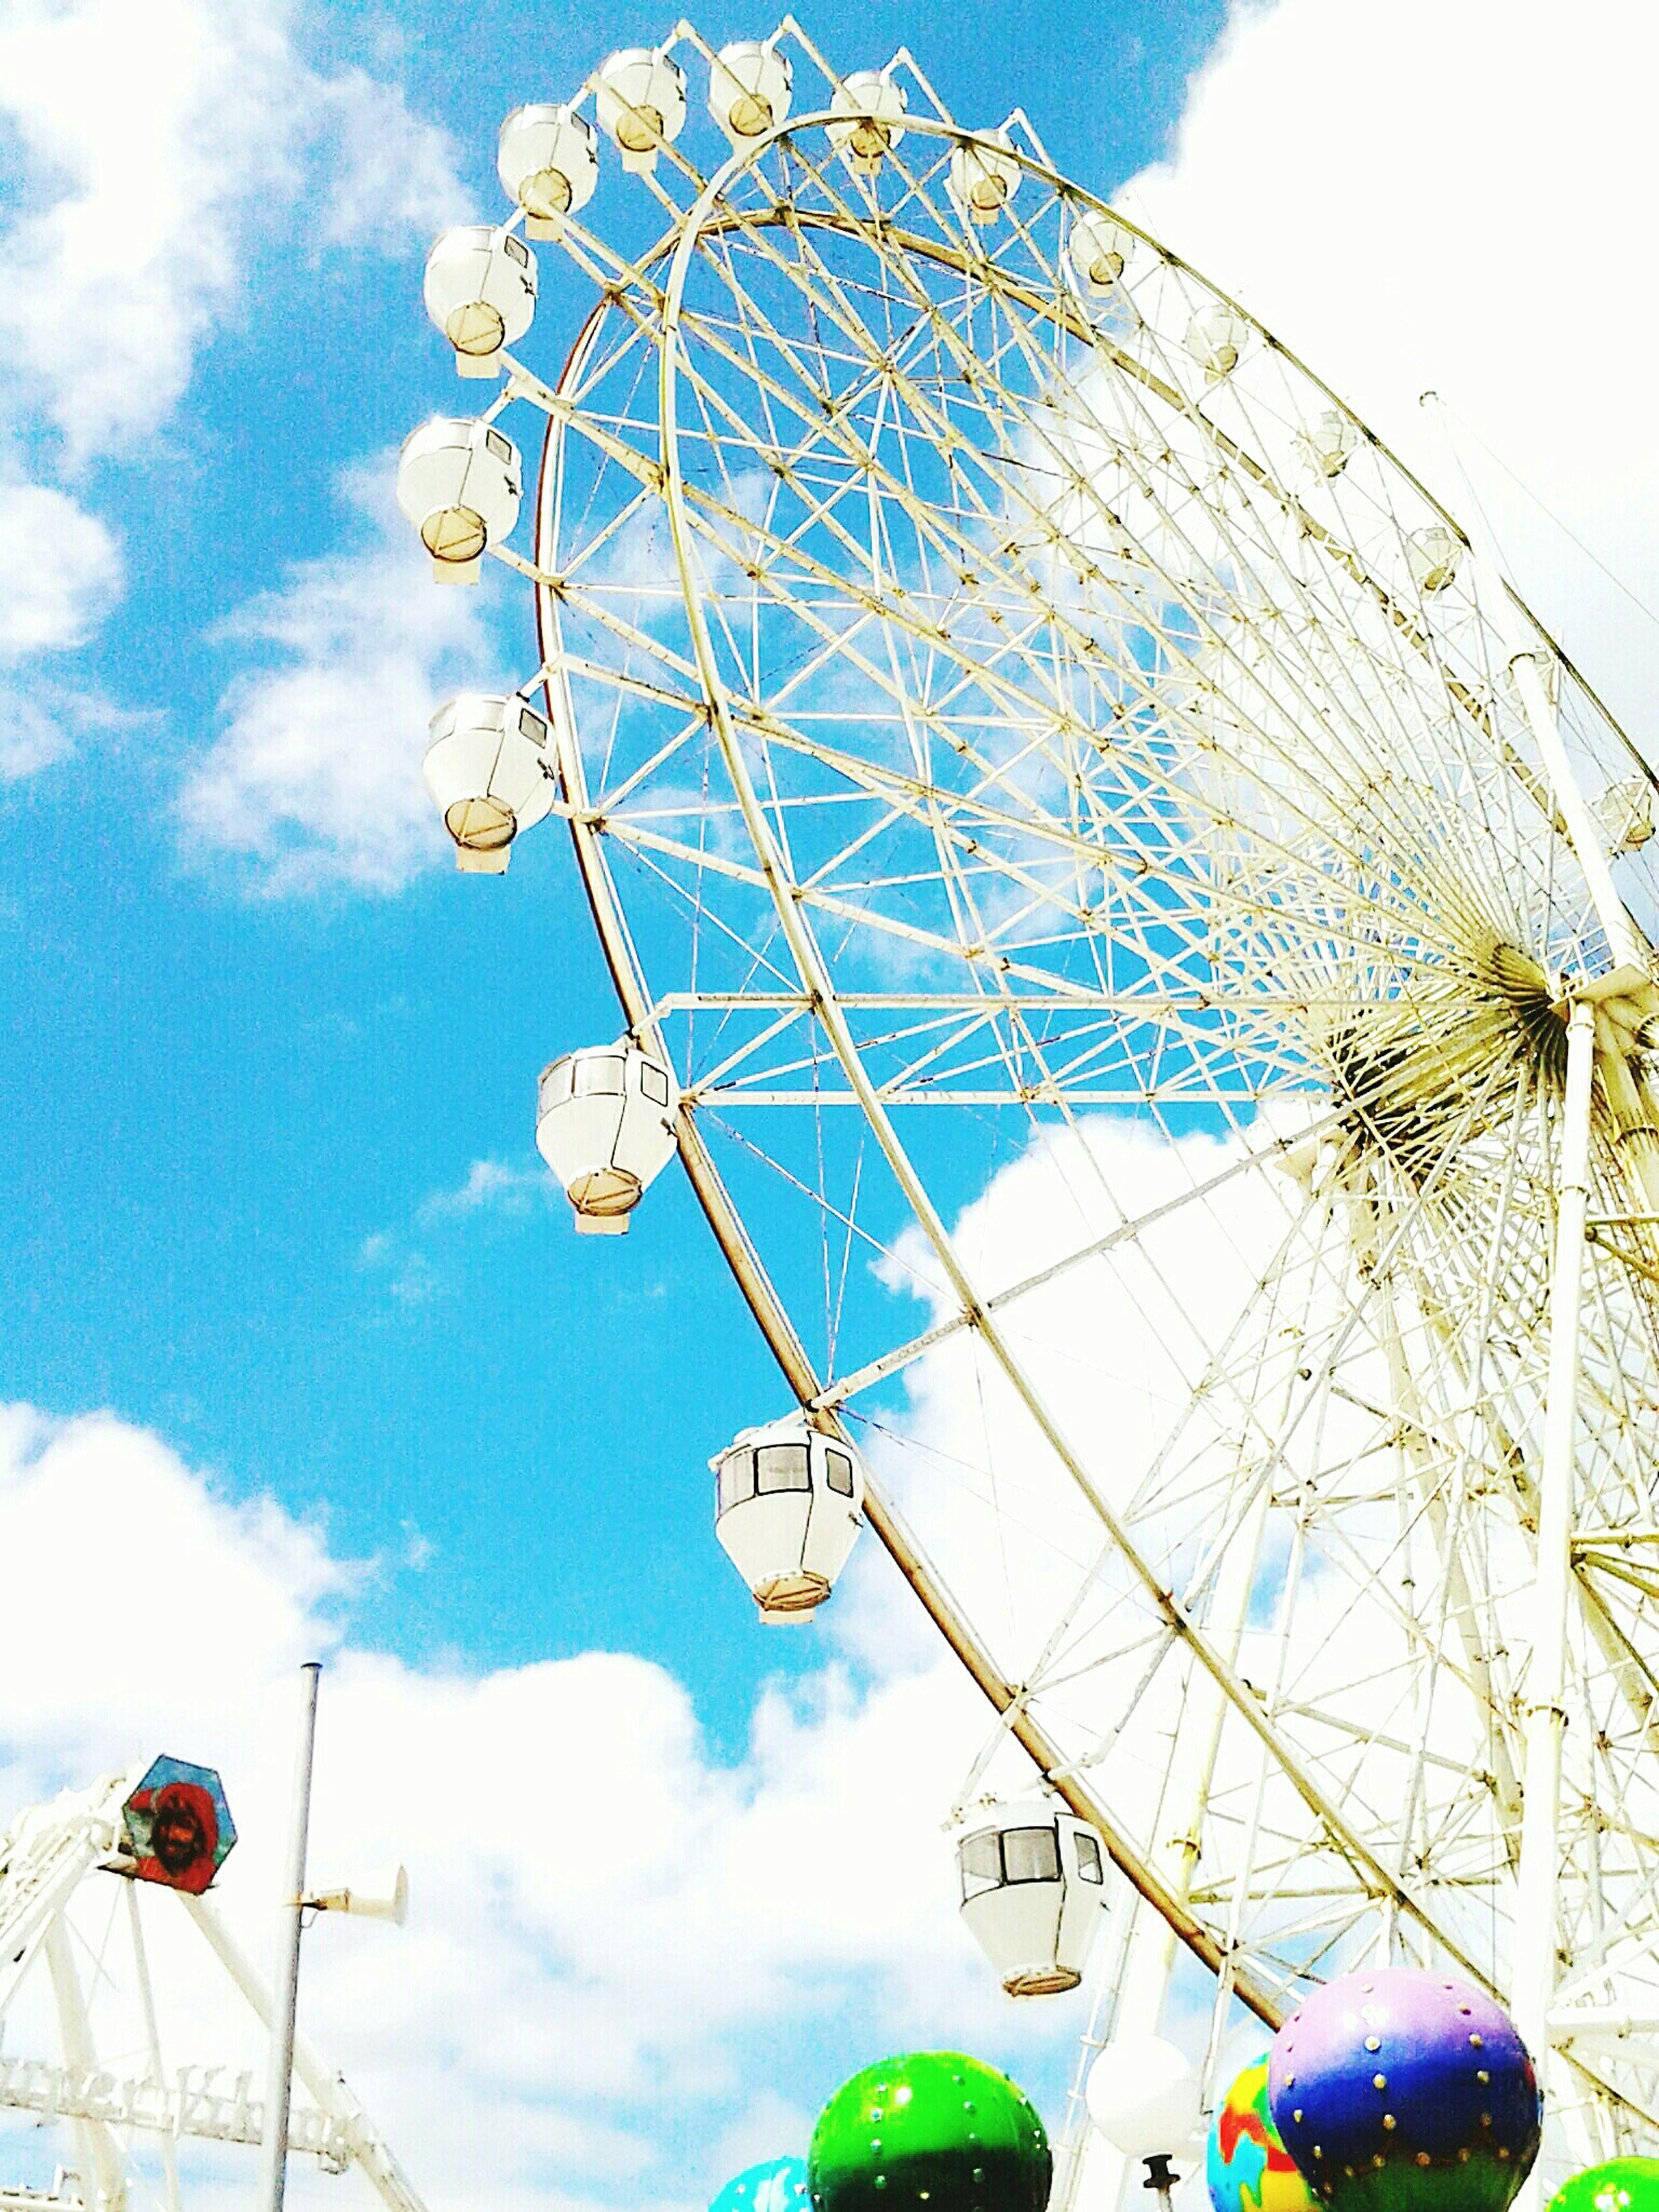 low angle view, amusement park, amusement park ride, ferris wheel, sky, arts culture and entertainment, cloud - sky, blue, fun, day, cloud, tall - high, lighting equipment, outdoors, street light, no people, metal, enjoyment, built structure, tree